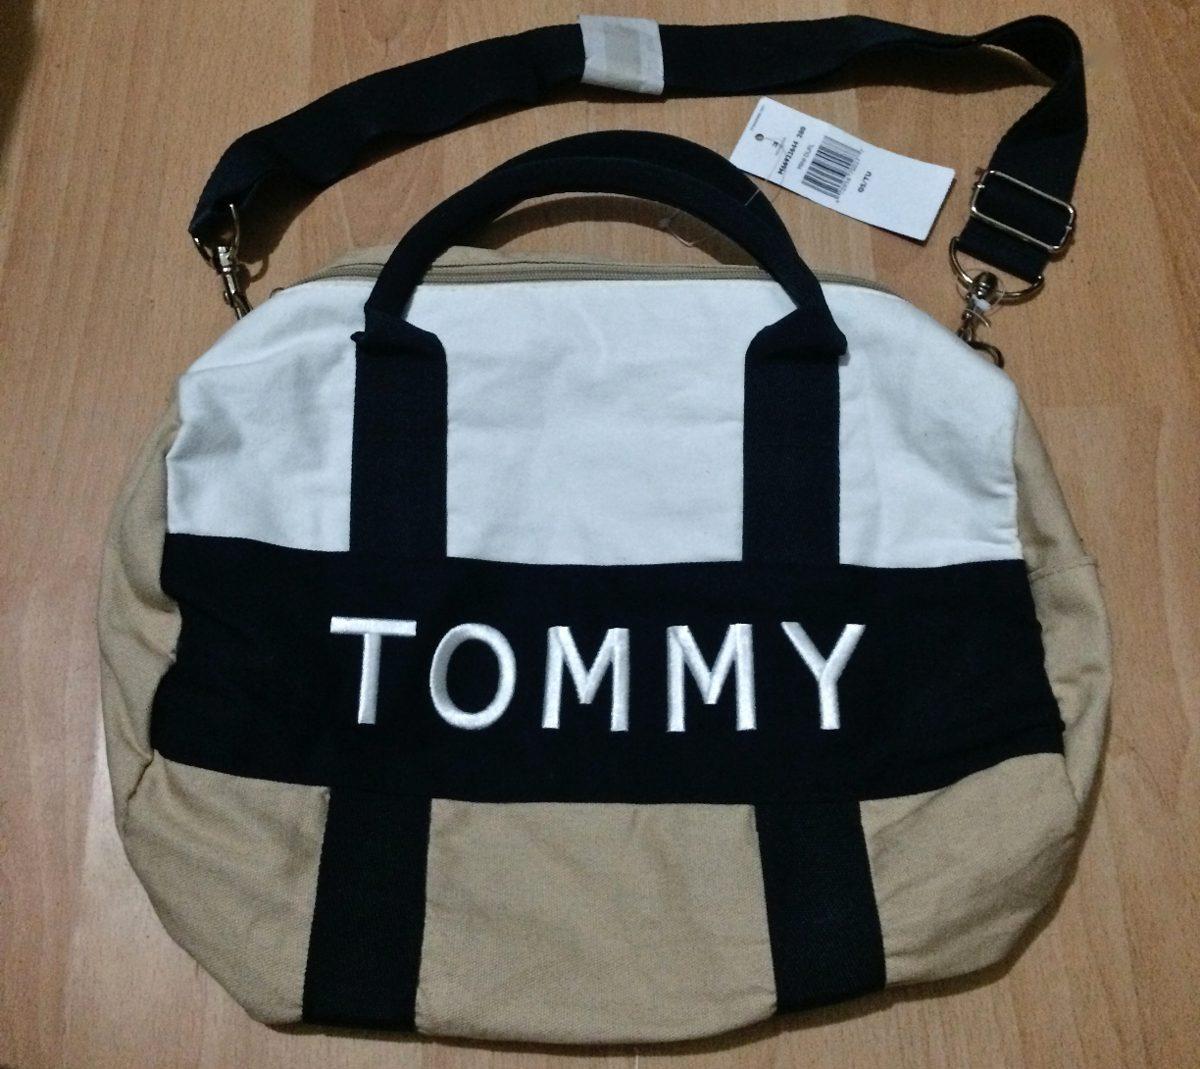 f2be6b7f1f4 Bolsa Maleta Mochila Tommy Hilfiger 100% Original!! -   899.00 en ...